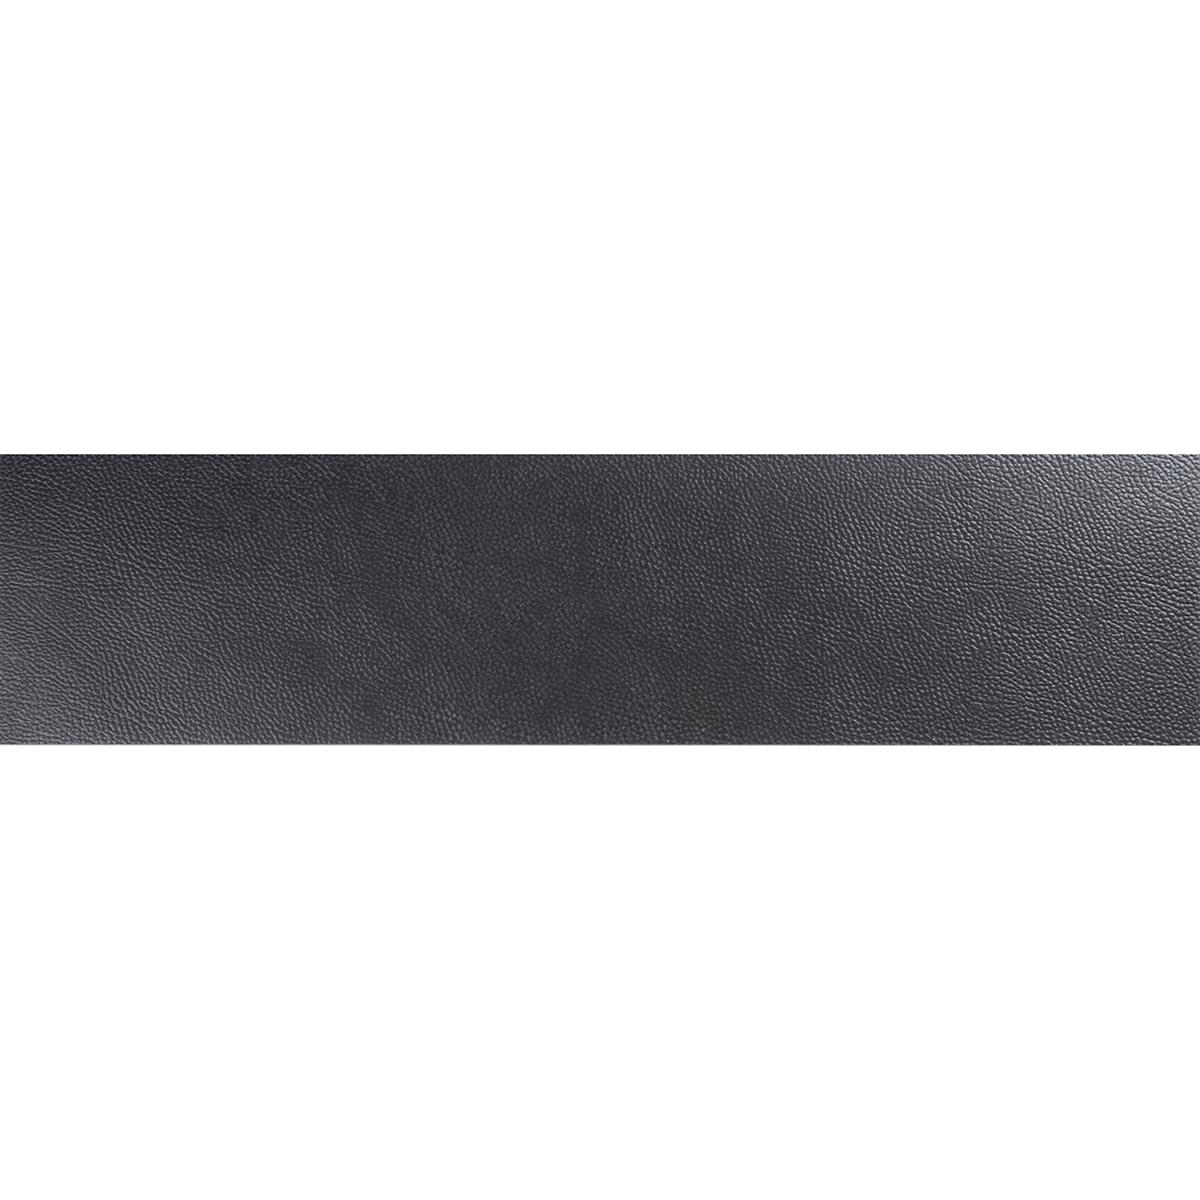 Kakel Arredo Line Dekor Snakeskin Mönstrad Black 14,8×60 cm